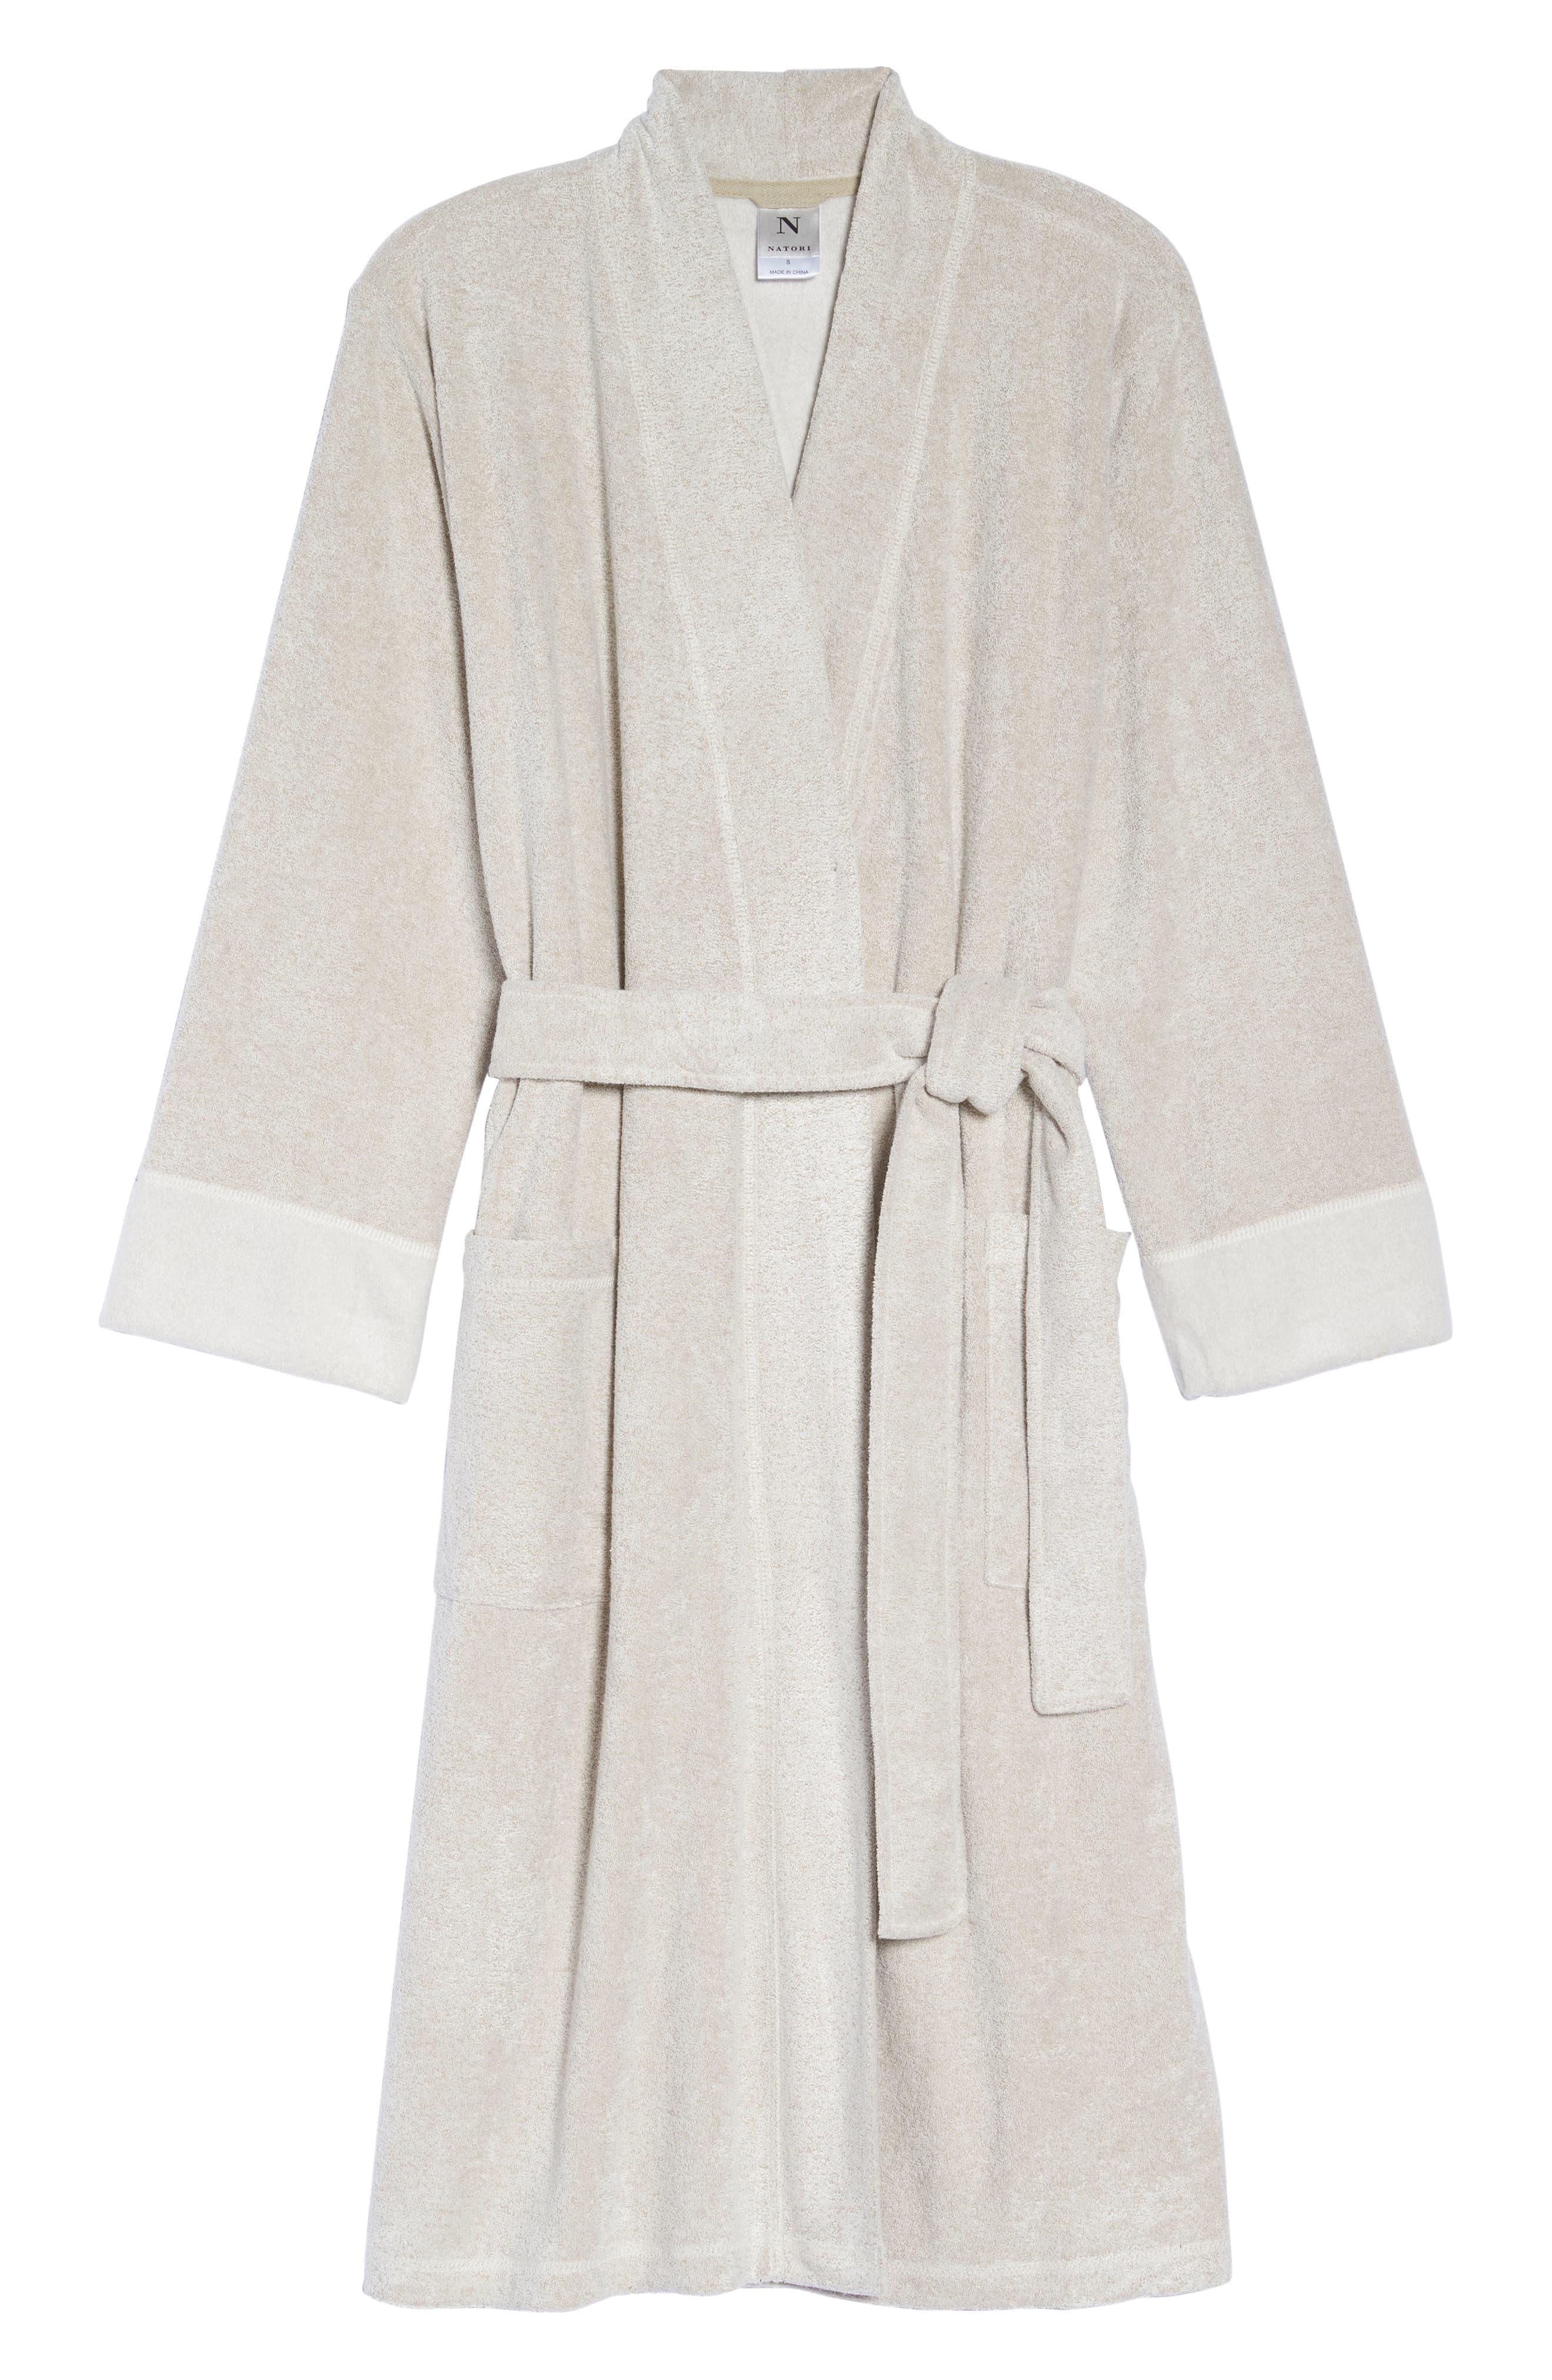 NATORI, 'Nirvana' Midi Robe, Alternate thumbnail 6, color, 273